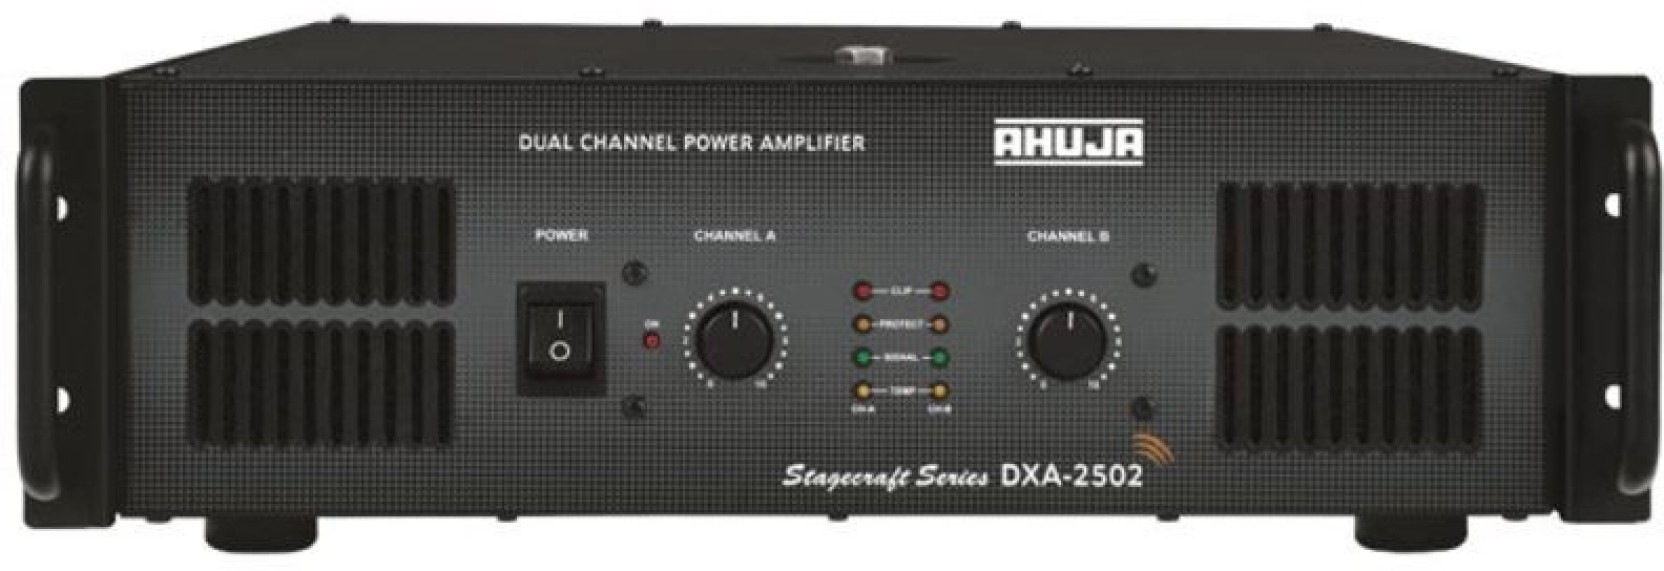 Ahuja Dxa 2502 Av Power Amplifier Price In India Buy 32 Watt Share